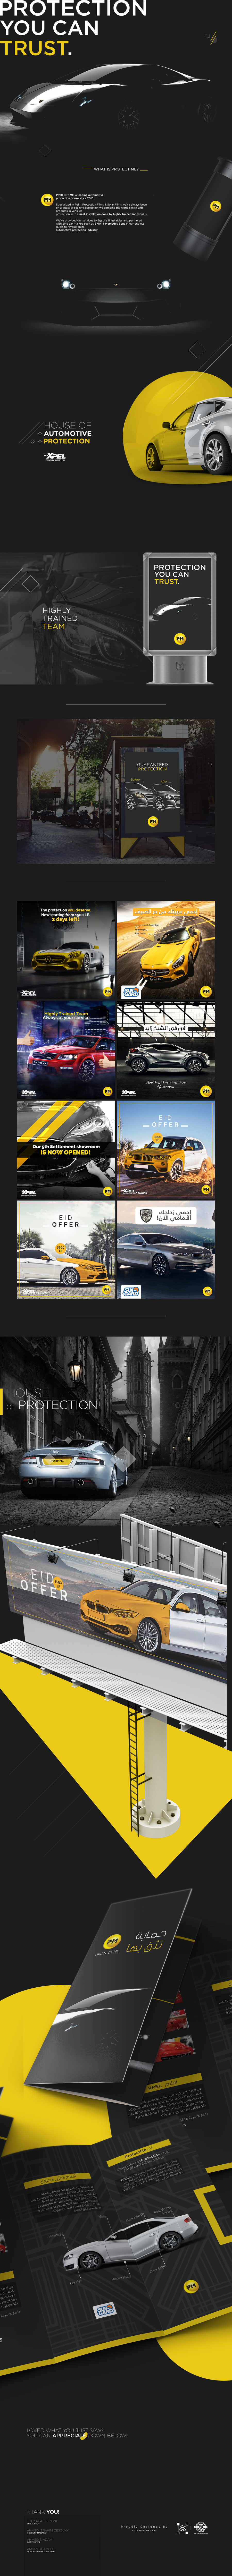 protect me car protection Car care Advertising Campaign design social media gigital design billboard Outdoor